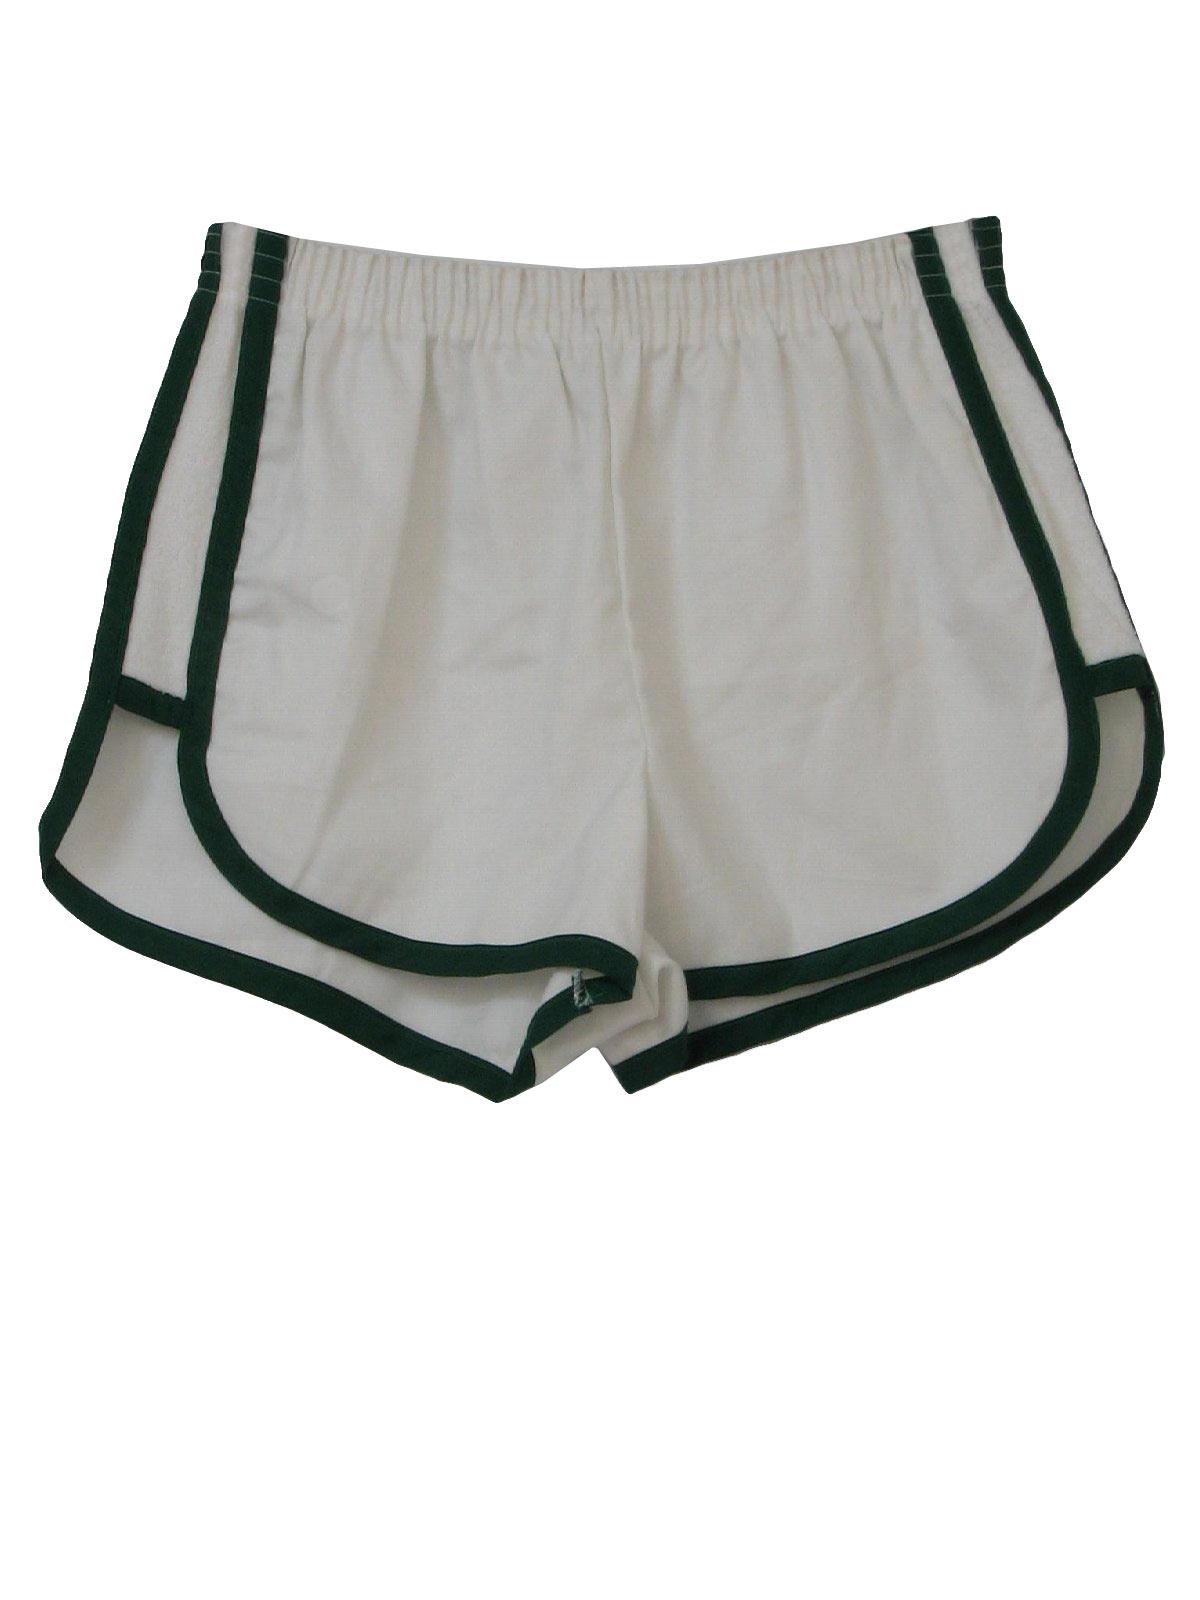 70s Shorts Jcpenney Gym Shorts 70s Jcpenney Gym Shorts